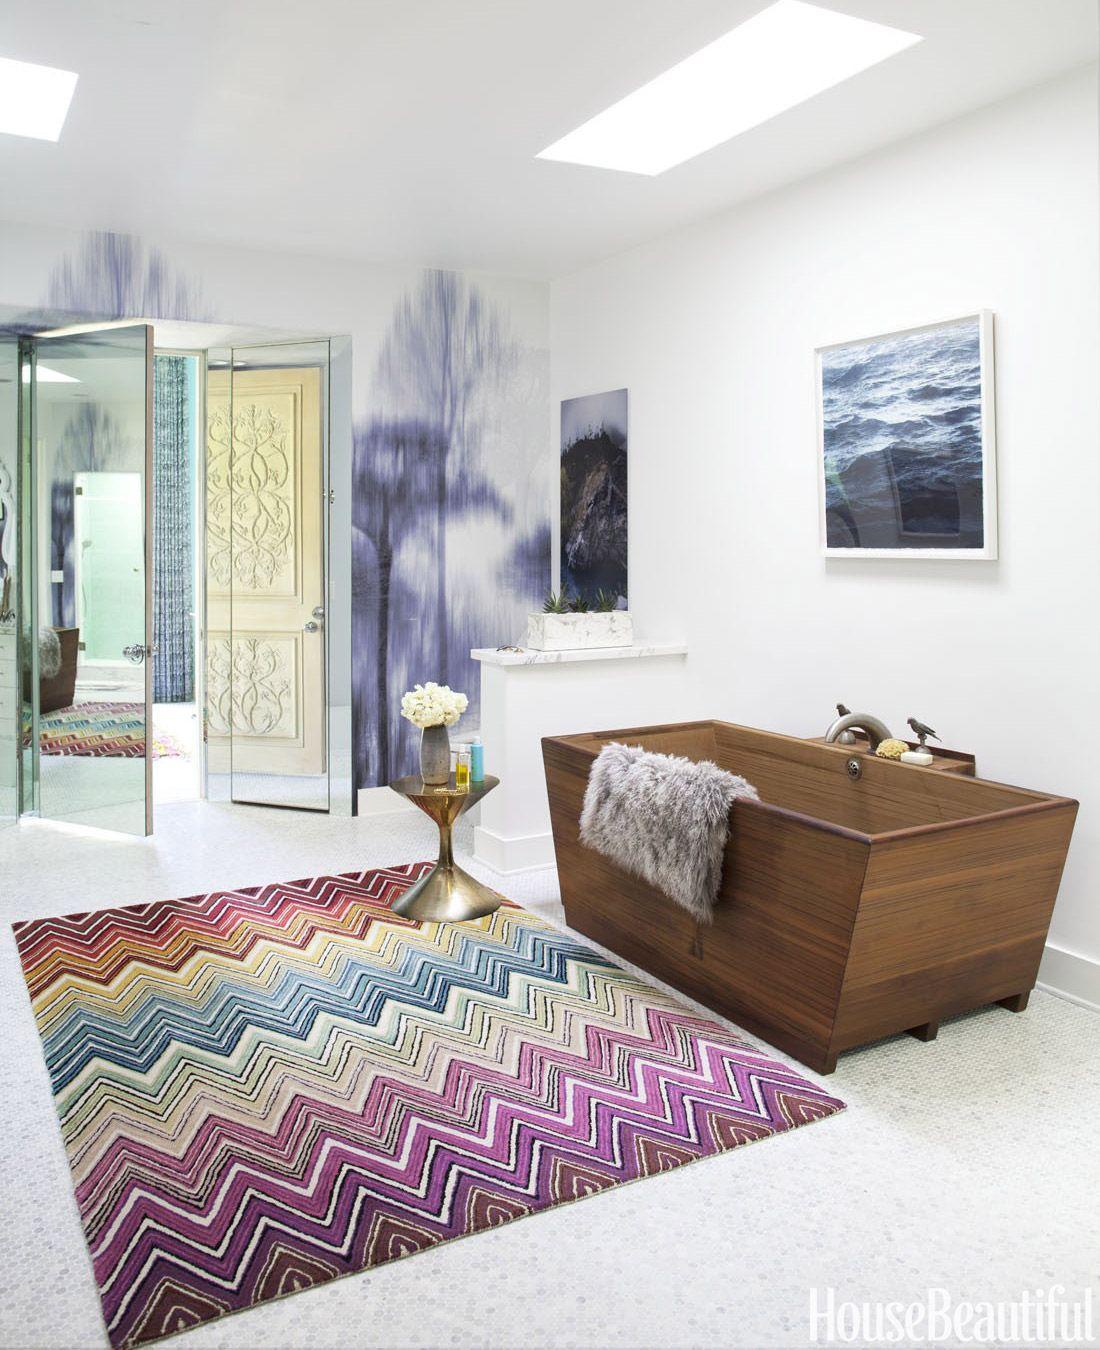 Best Bathroom Design Ideas Decor Pictures Of Stylish Modern - Missoni black and white bath mat for bathroom decorating ideas